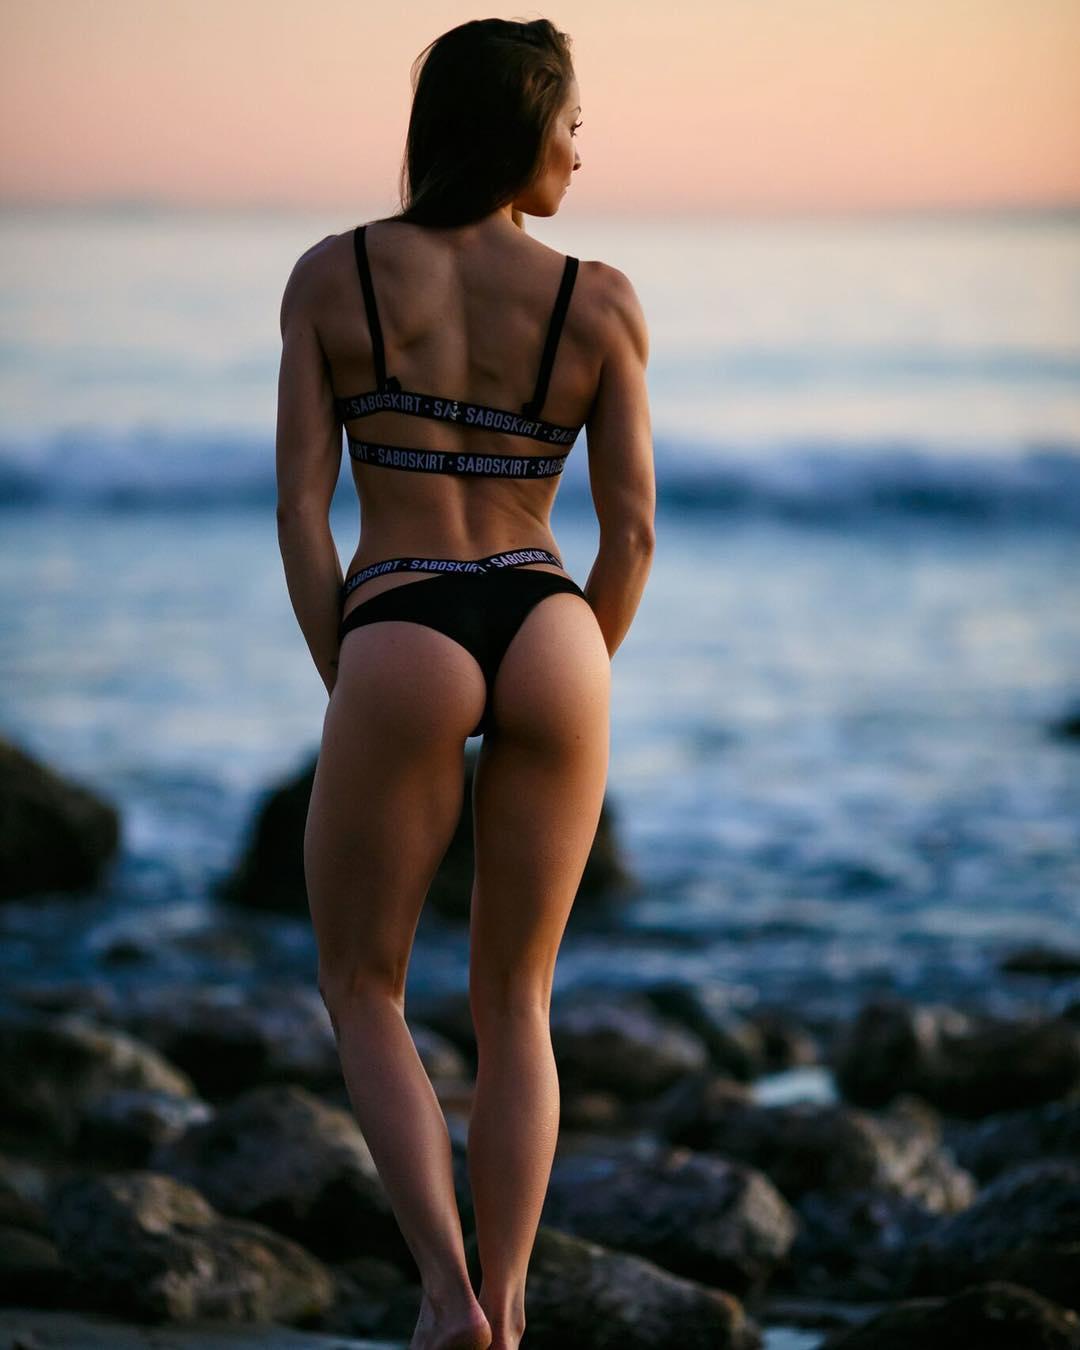 Stephanie Marie nudes (39 foto and video), Ass, Sideboobs, Selfie, butt 2015